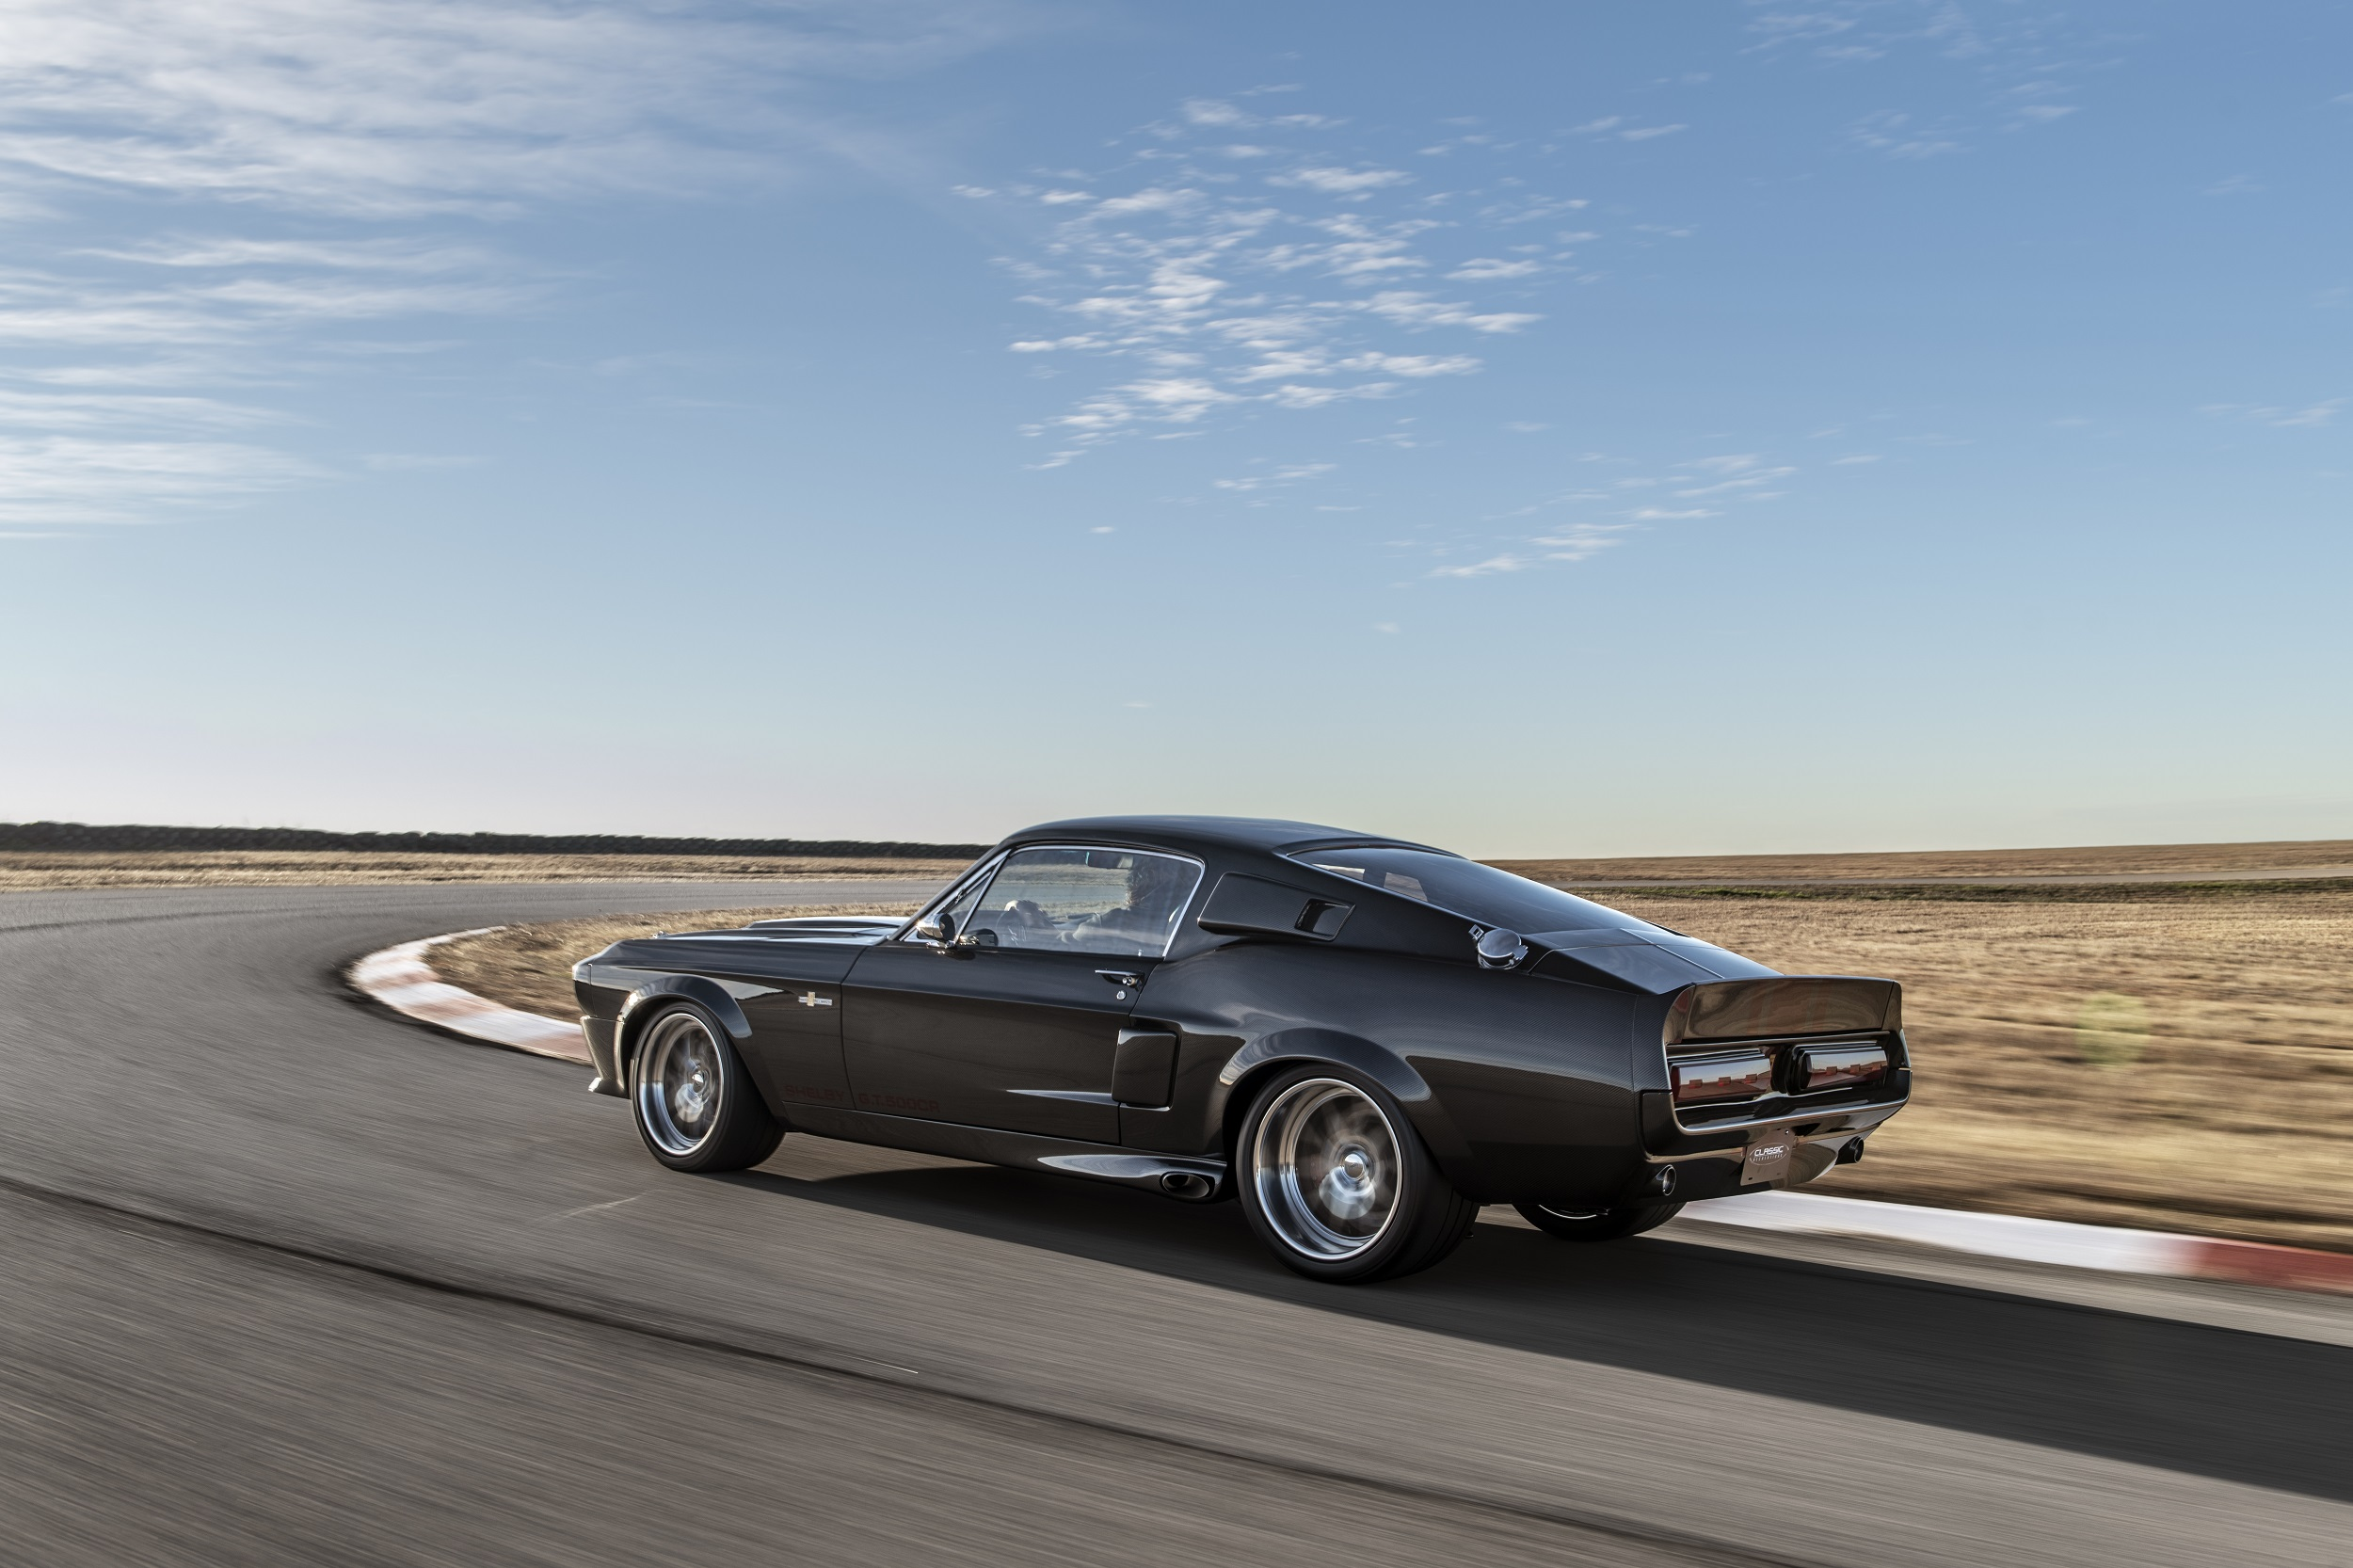 Classic Recreations Shelby GT500CR Carbon SpeedKore - 2021 - rear side-face / profil arrière - on track / sur piste